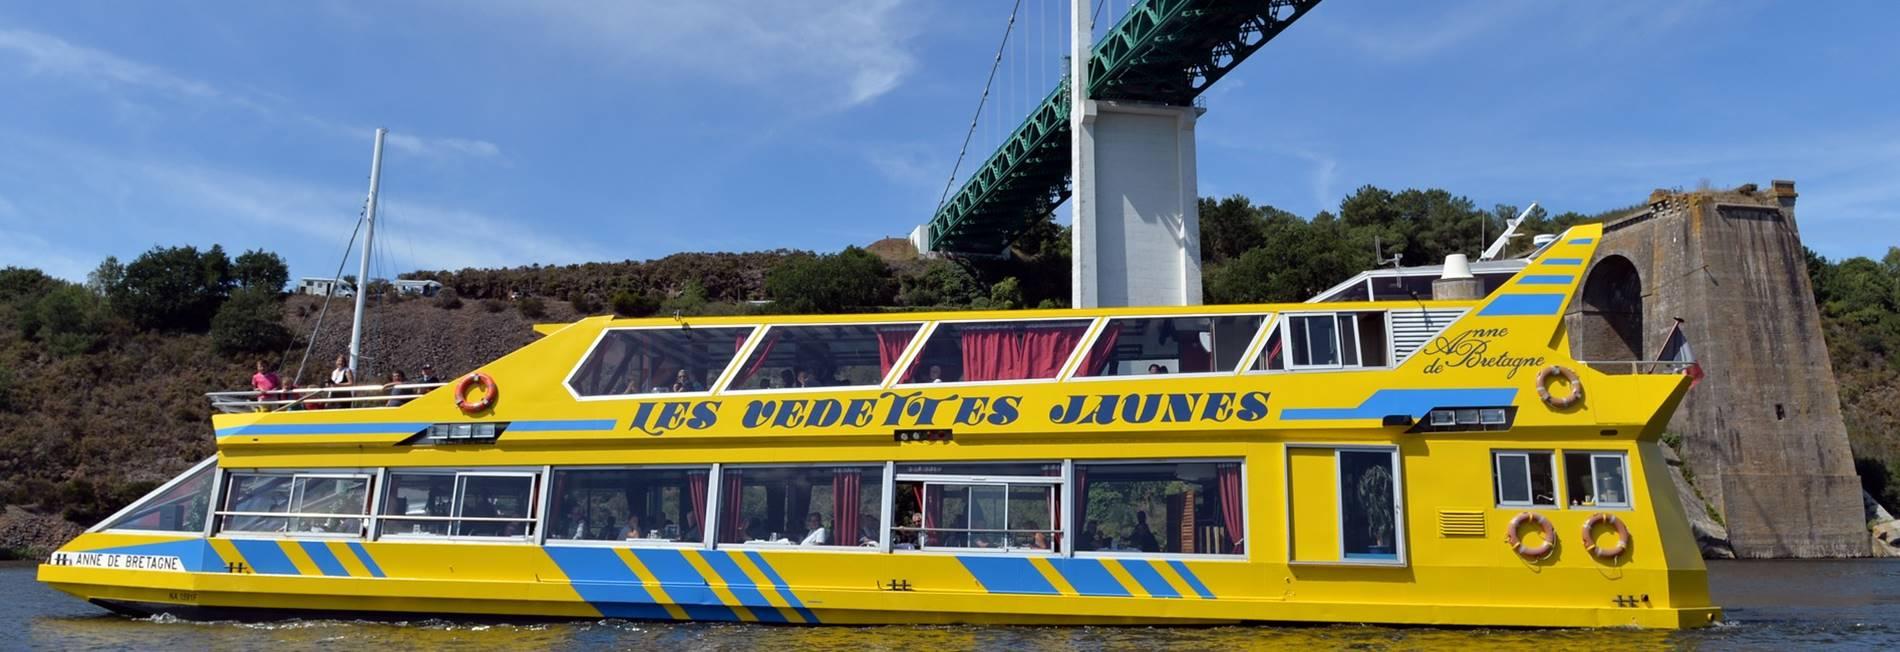 vedettes-jaunes-restaurant-croisieres-morbihan © ©M.Renac-Morbihan.com.